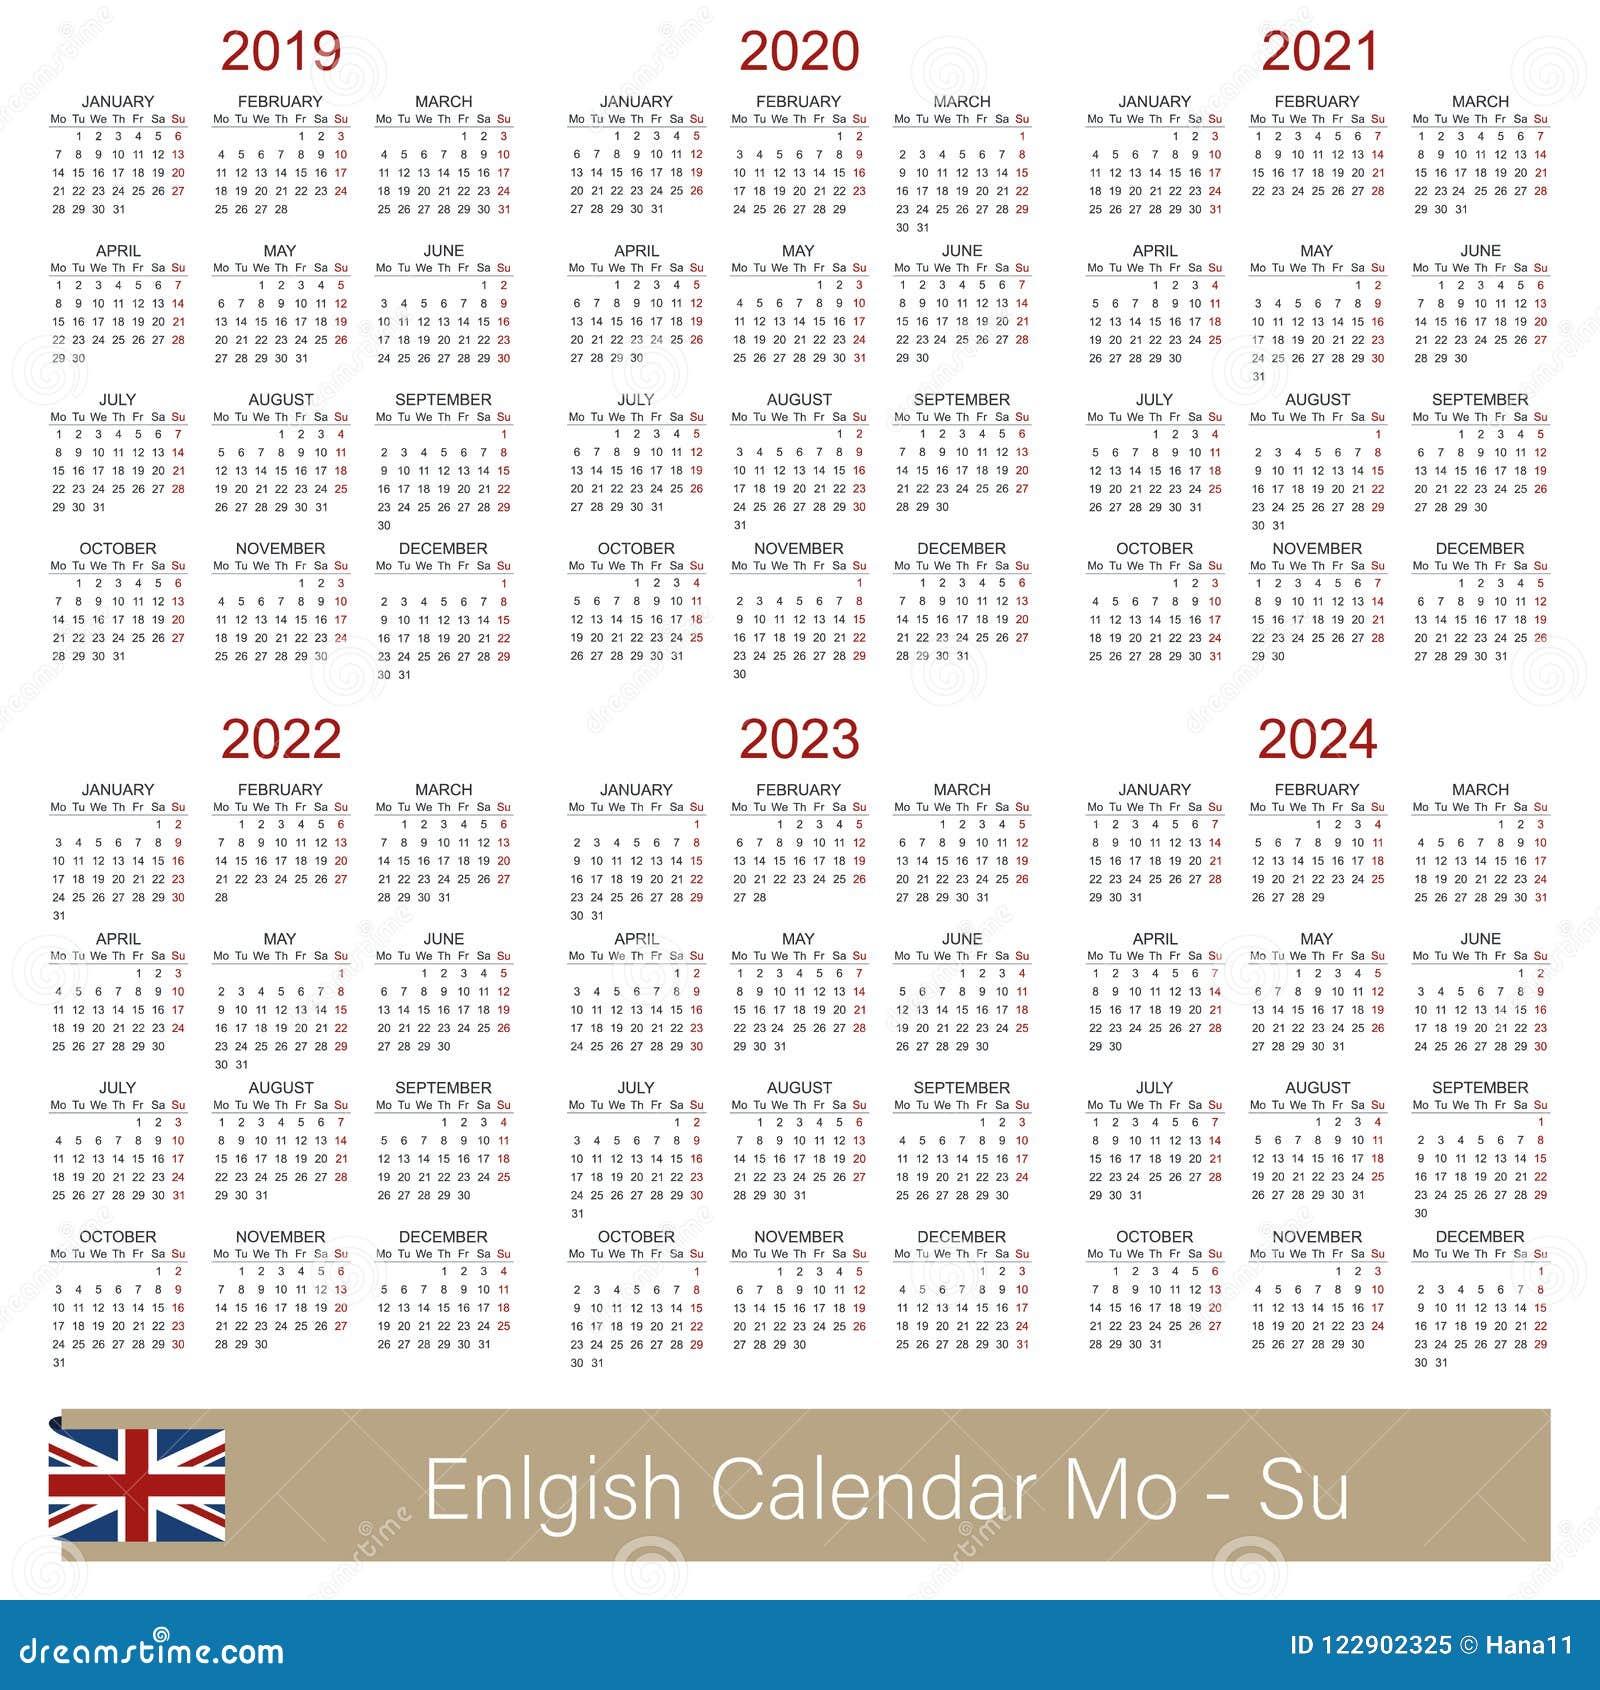 5 Year Calendar Starting 2019 English calendar 2019 2024 stock vector. Illustration of design